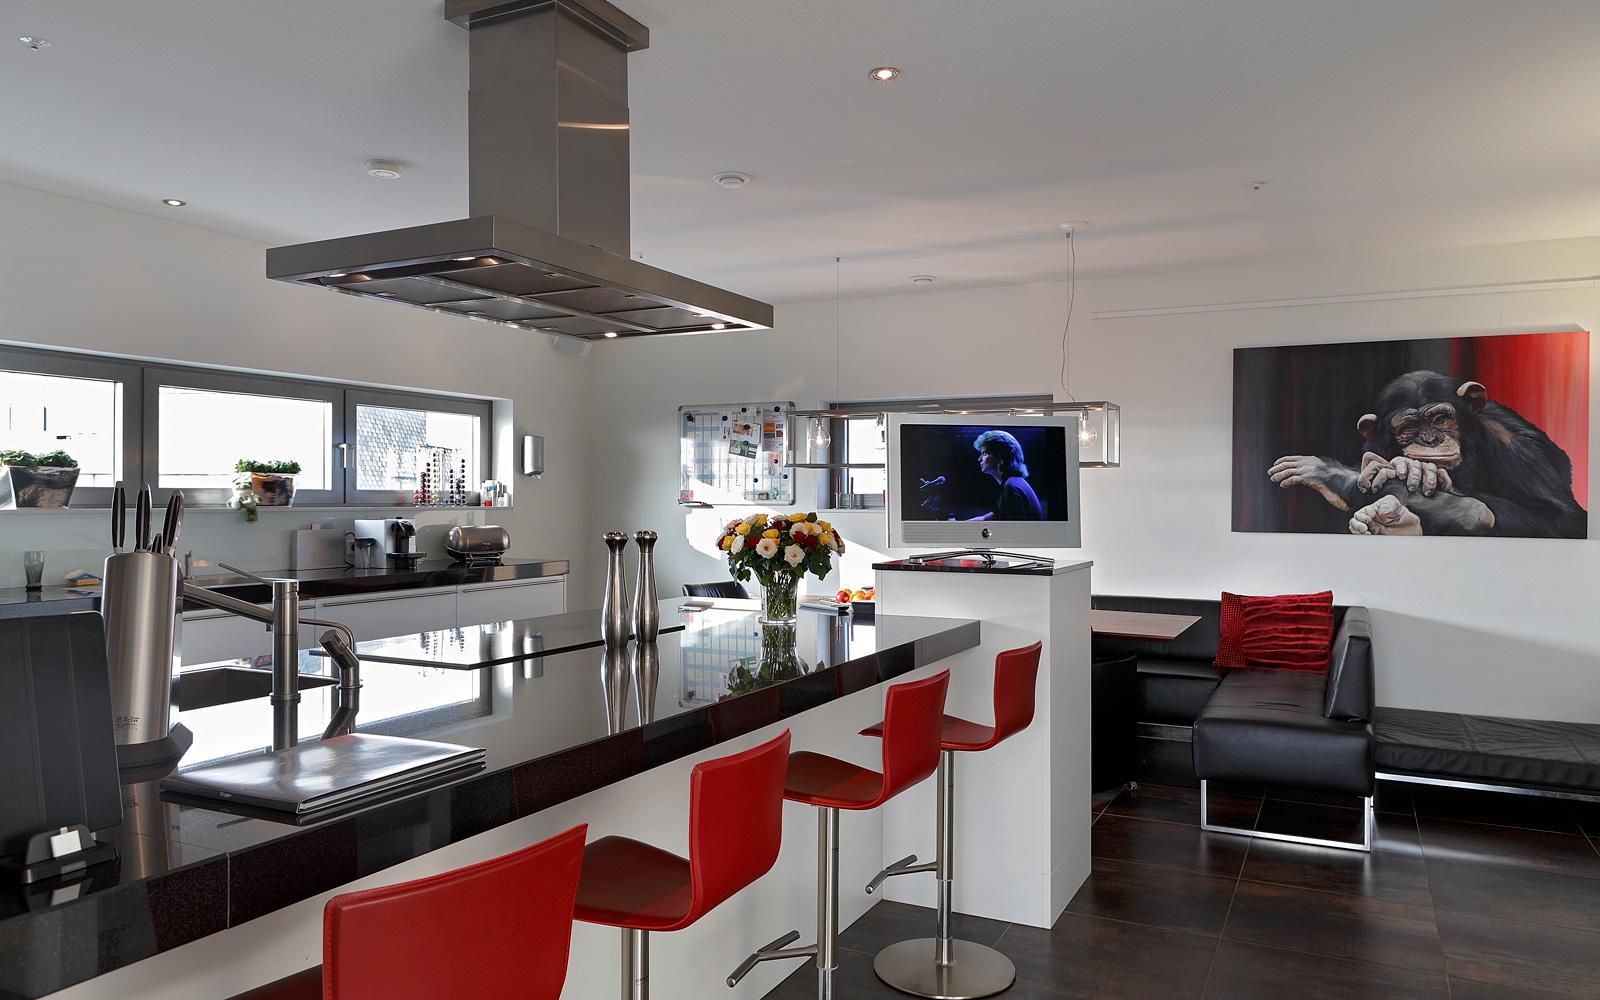 Keuken, kookeiland, bar, krukjes, strak, wit, afzuigkap, ruimtelijk, penthouse, Crepain Binst